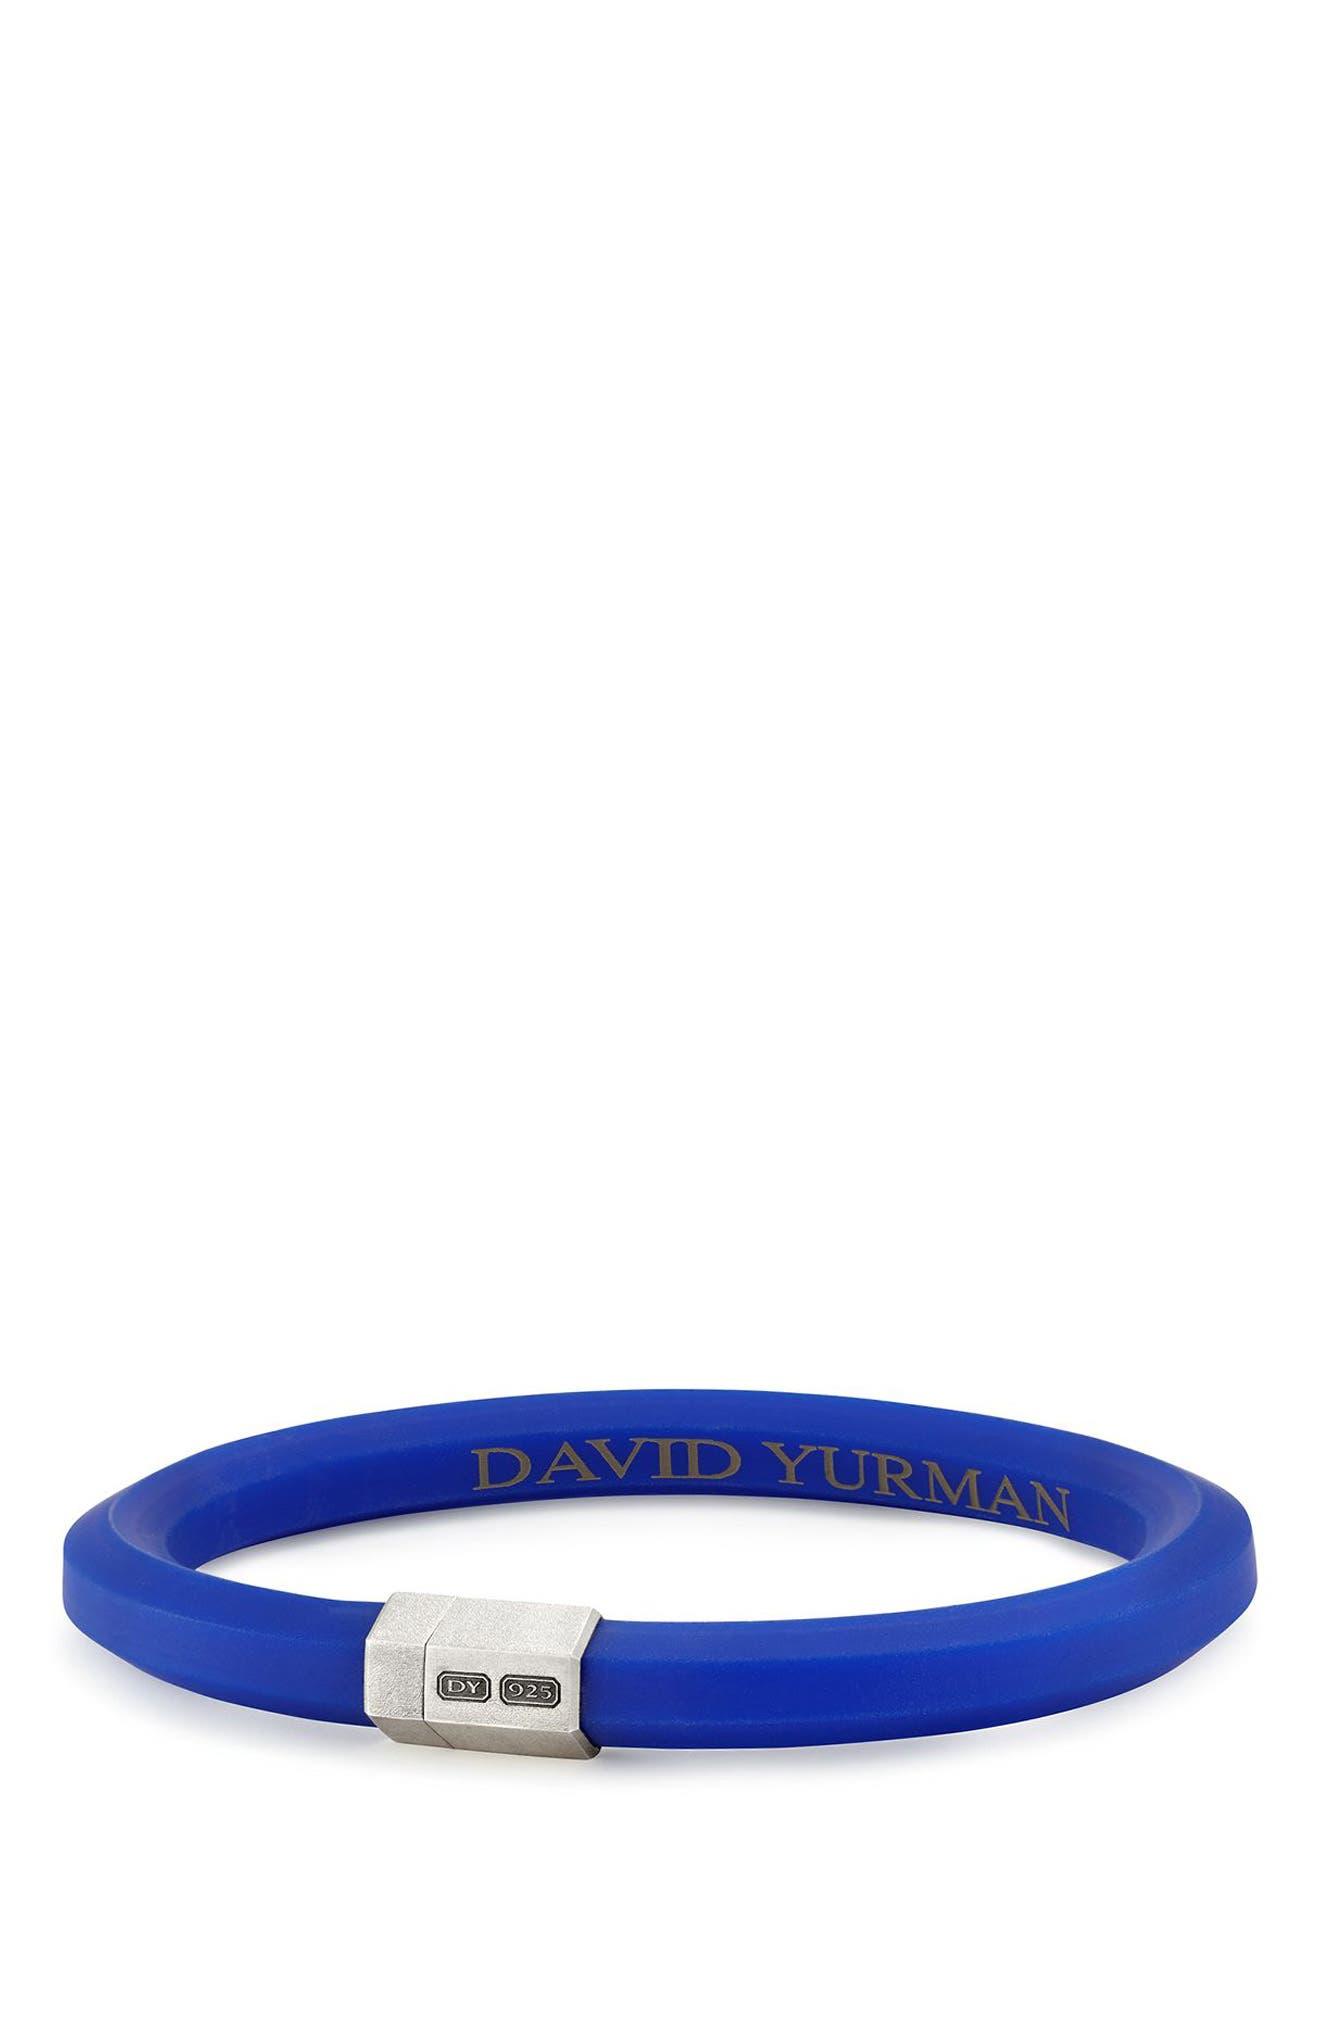 Streamline Rubber ID Bracelet in Black,                             Main thumbnail 1, color,                             BLUE